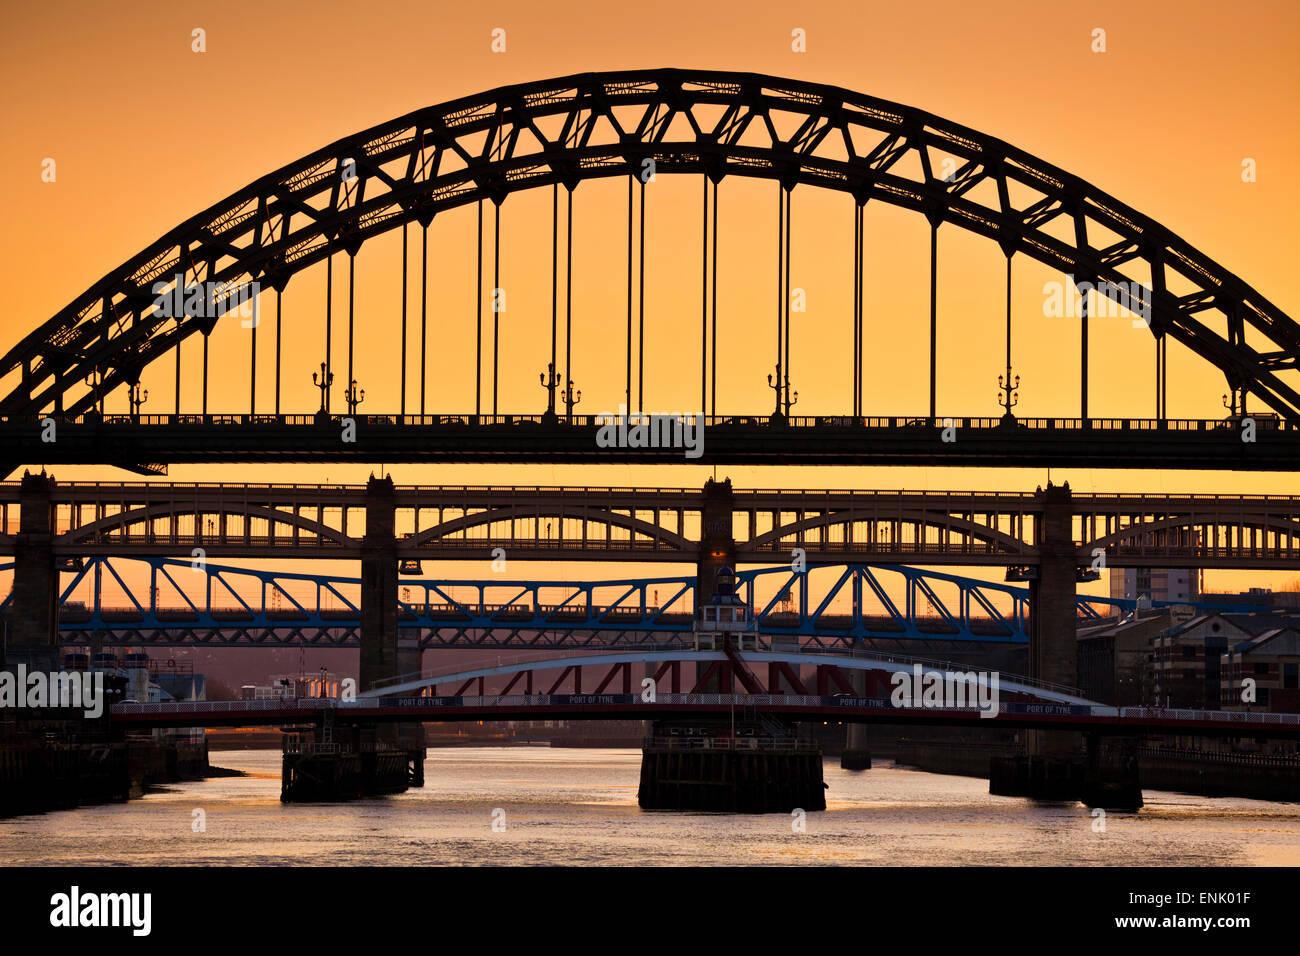 Skyline von Newcastle Upon Tyne, Gateshead mit der Tyne Brücke über Fluß Tyne, Tyne and Wear, Tyneside, Stockbild